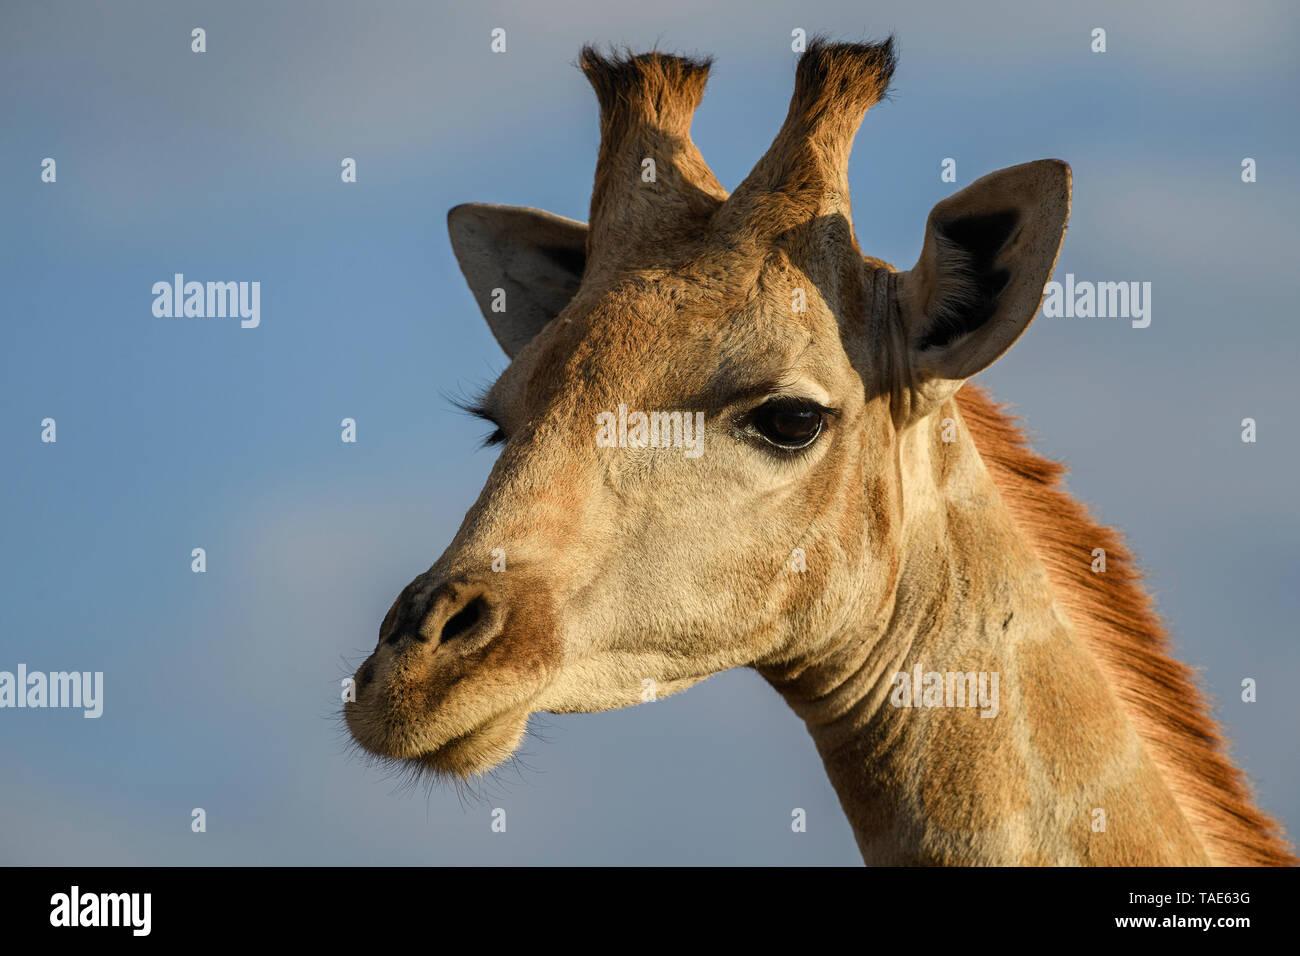 Giraffe - Giraffa giraffa, safari in Etosha National Park, Namibia, Africa. Cute member of African big five. Stock Photo